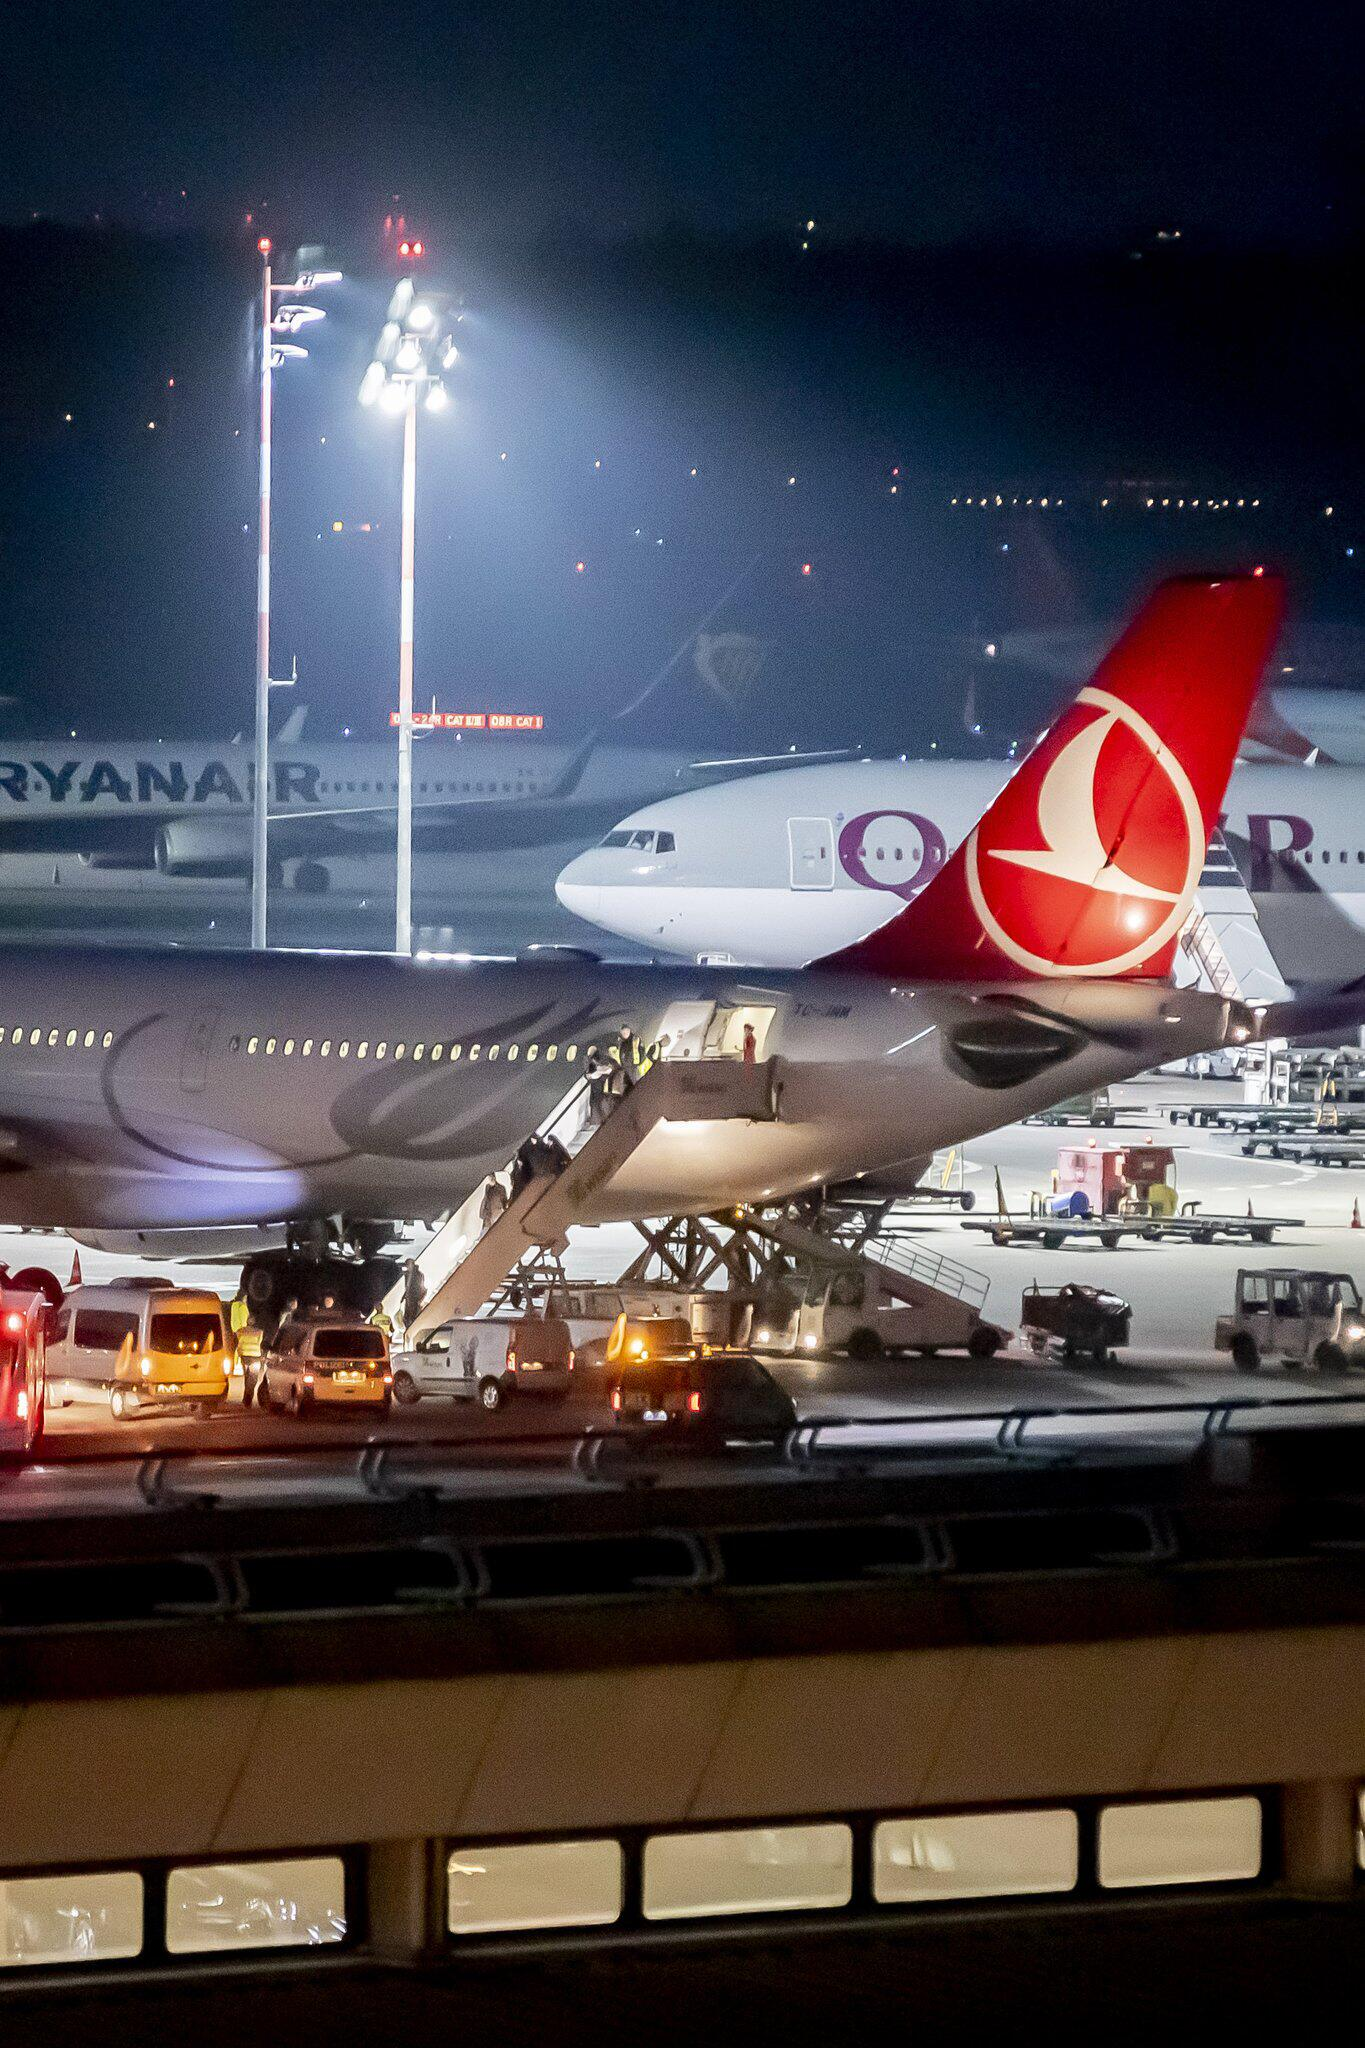 Bild zu Ankunft von Abgeschobenen am Flughafen Berlin-Tegel